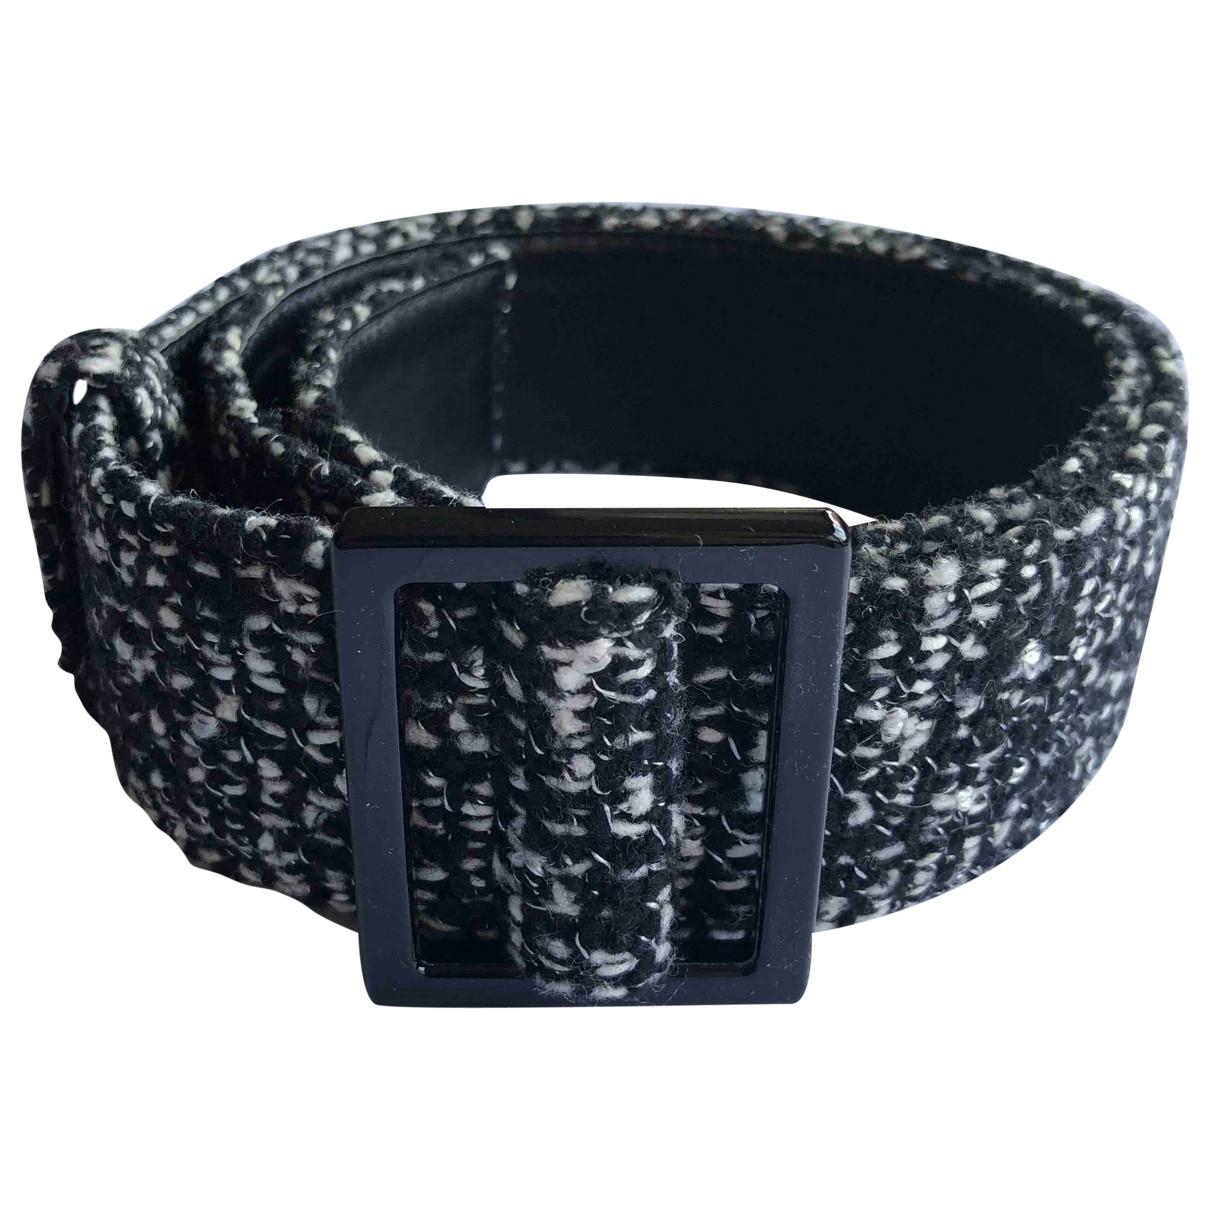 Yves Saint Laurent \N Multicolour Cotton belt for Women 80 cm